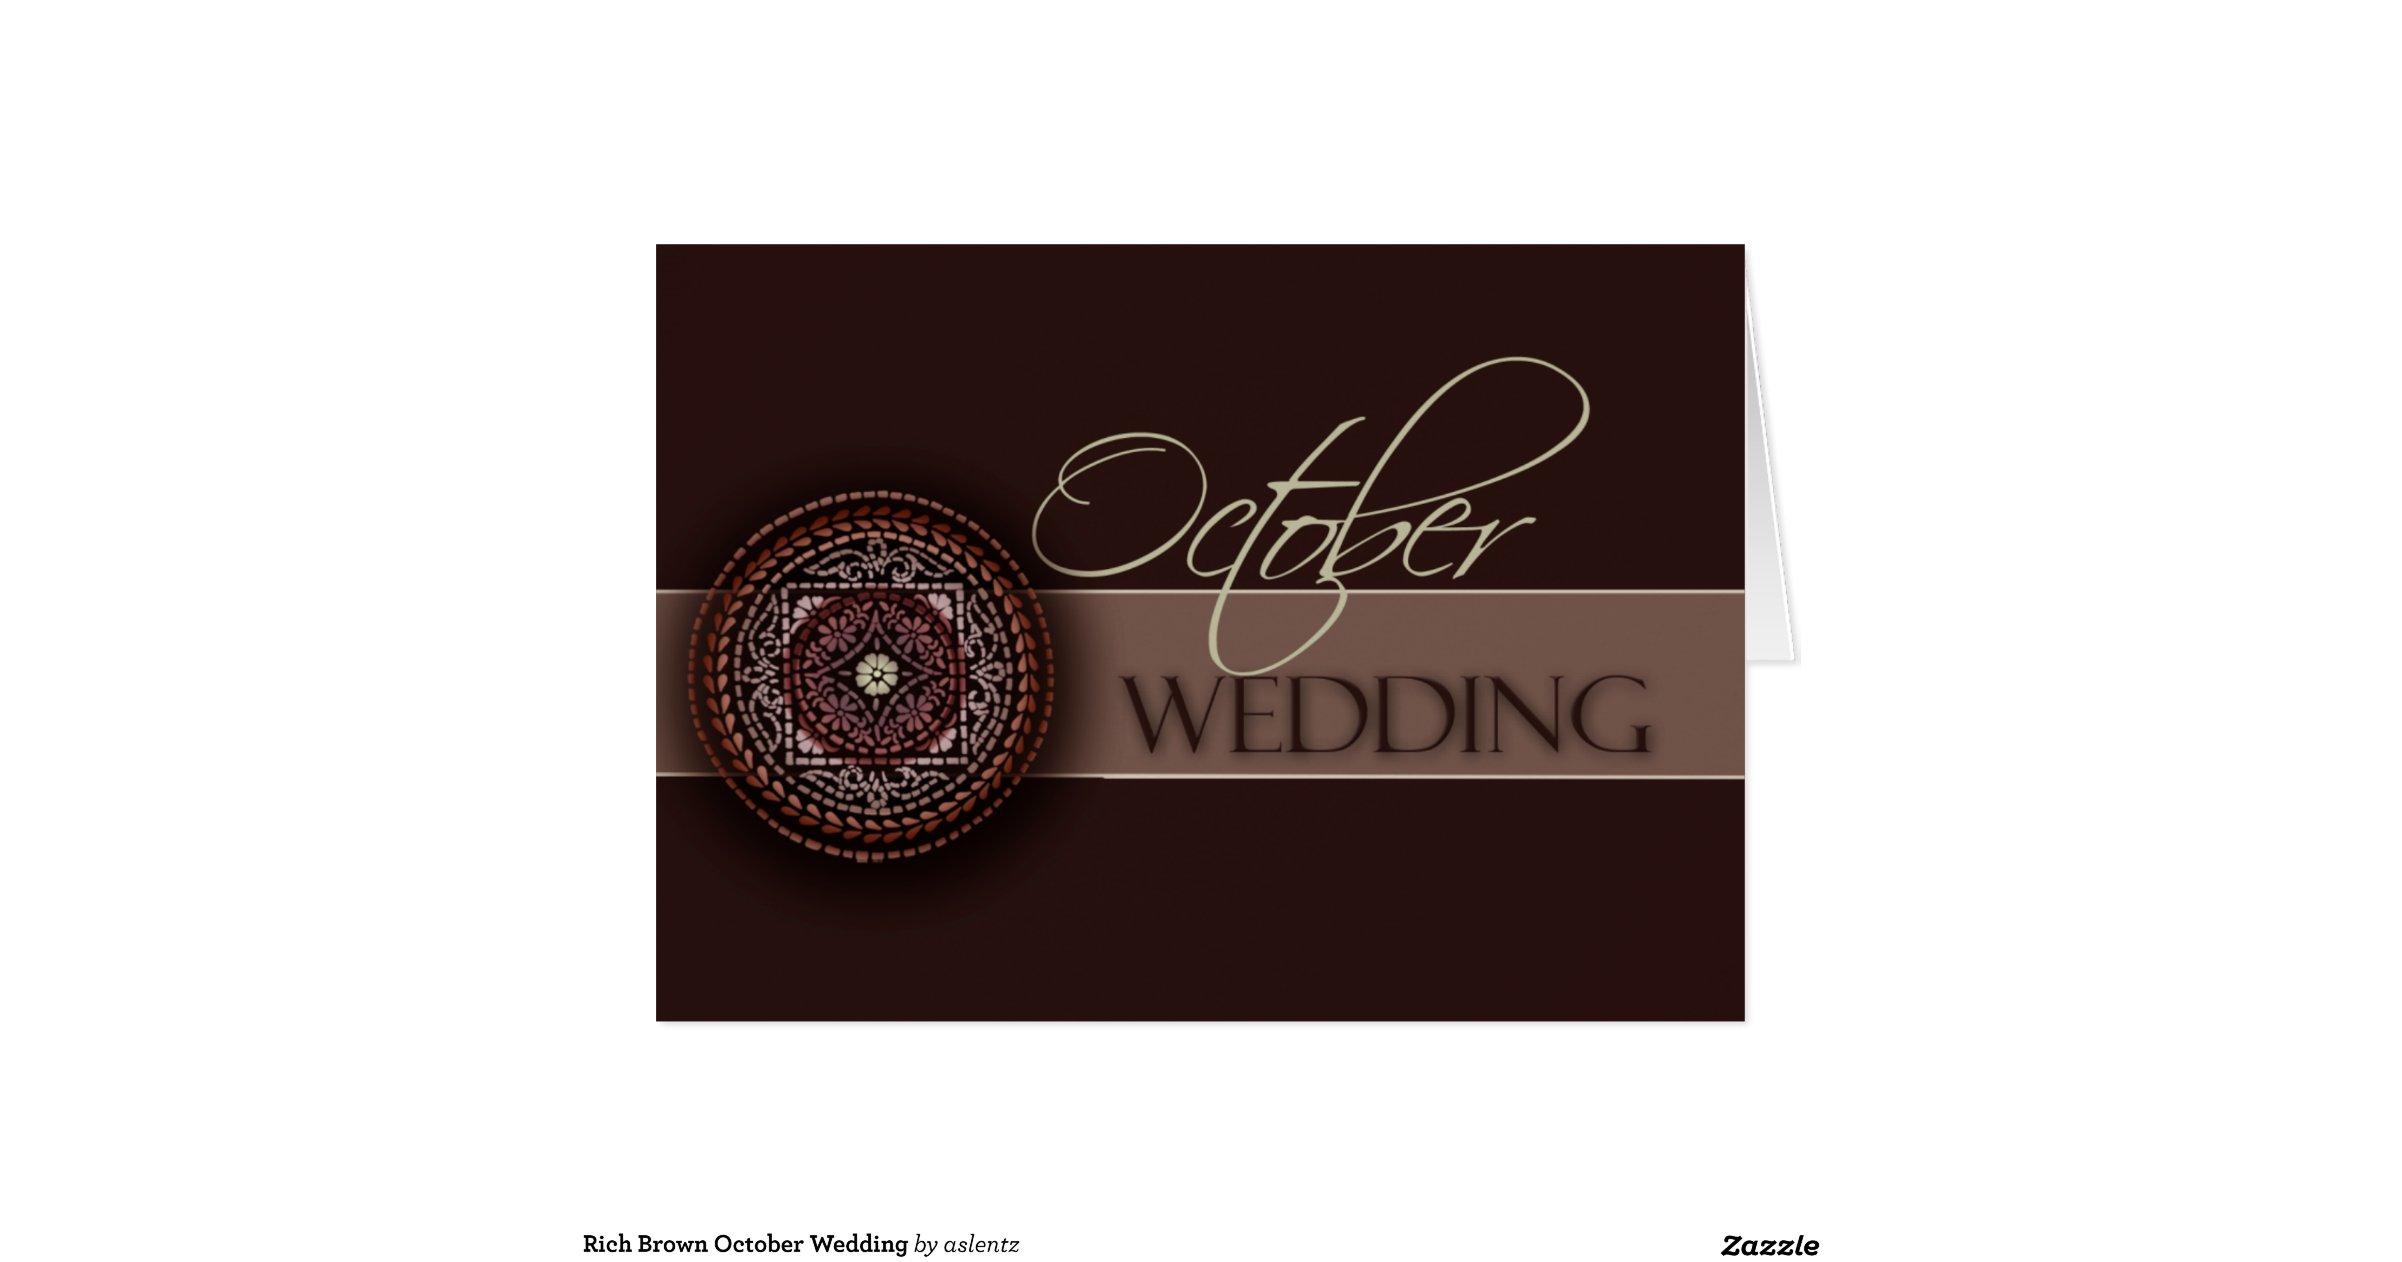 Rich Brown October Wedding Greeting Card